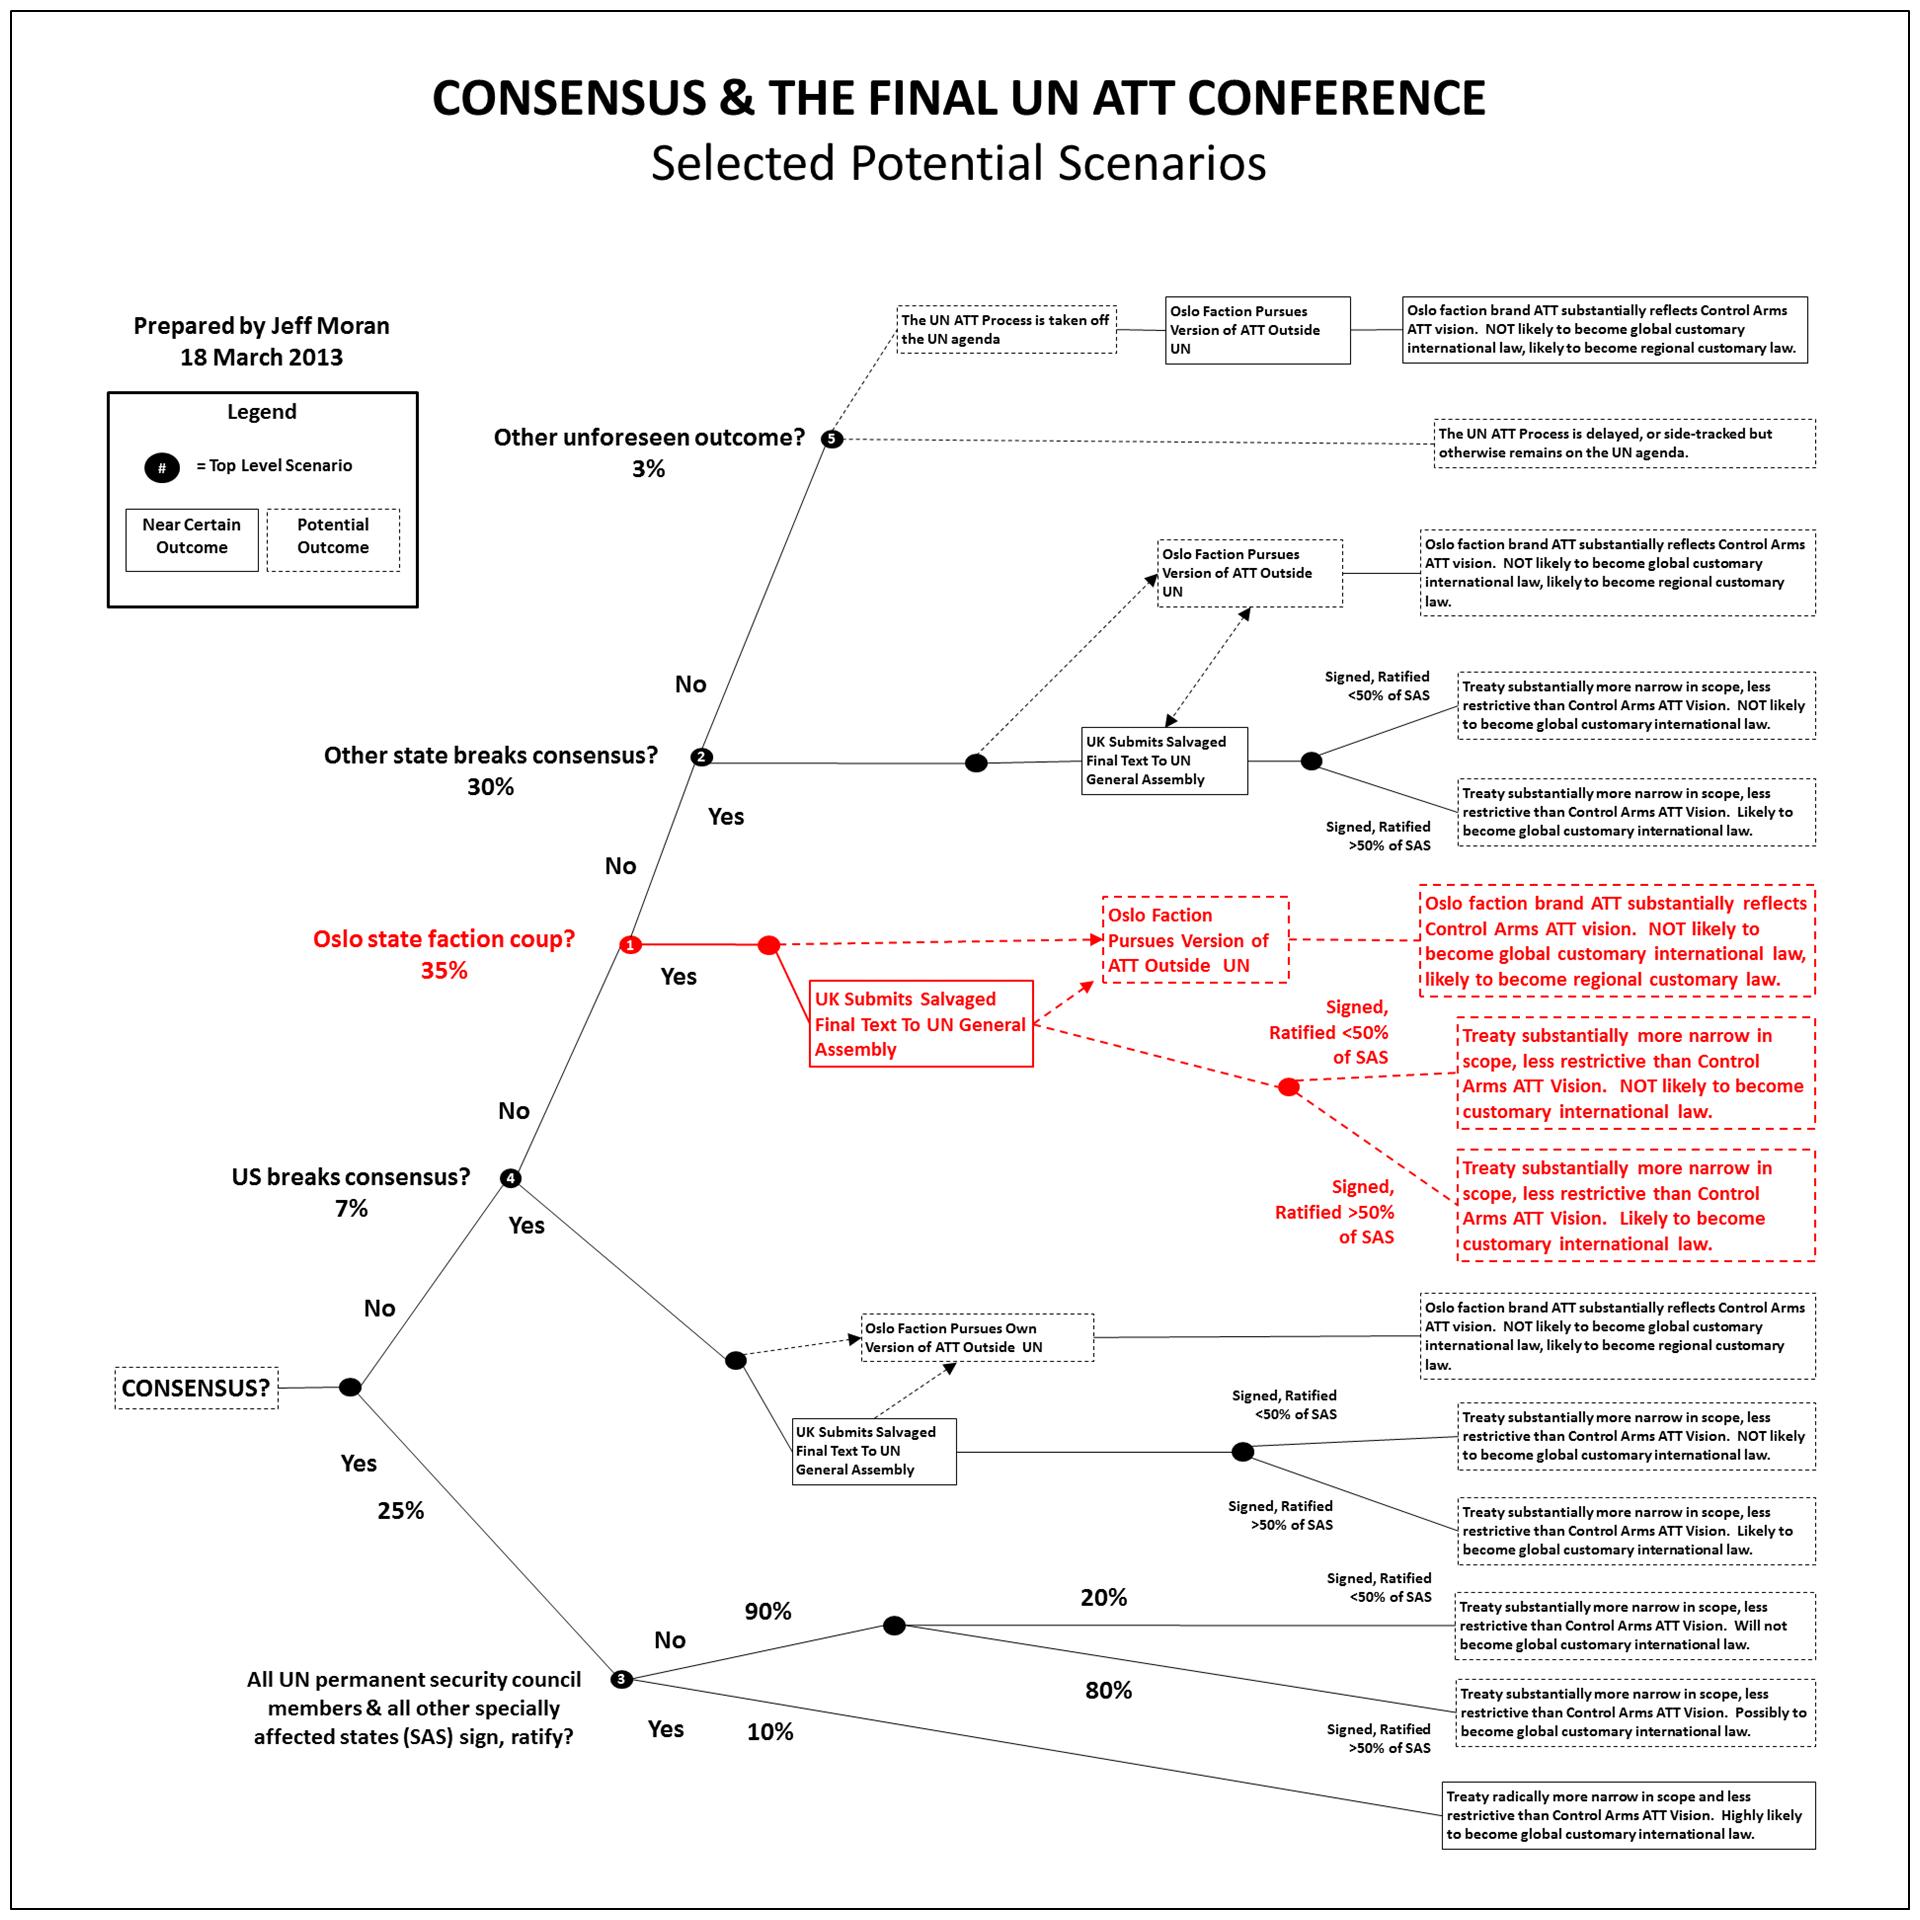 ConsensusScenarios8MAR13_1